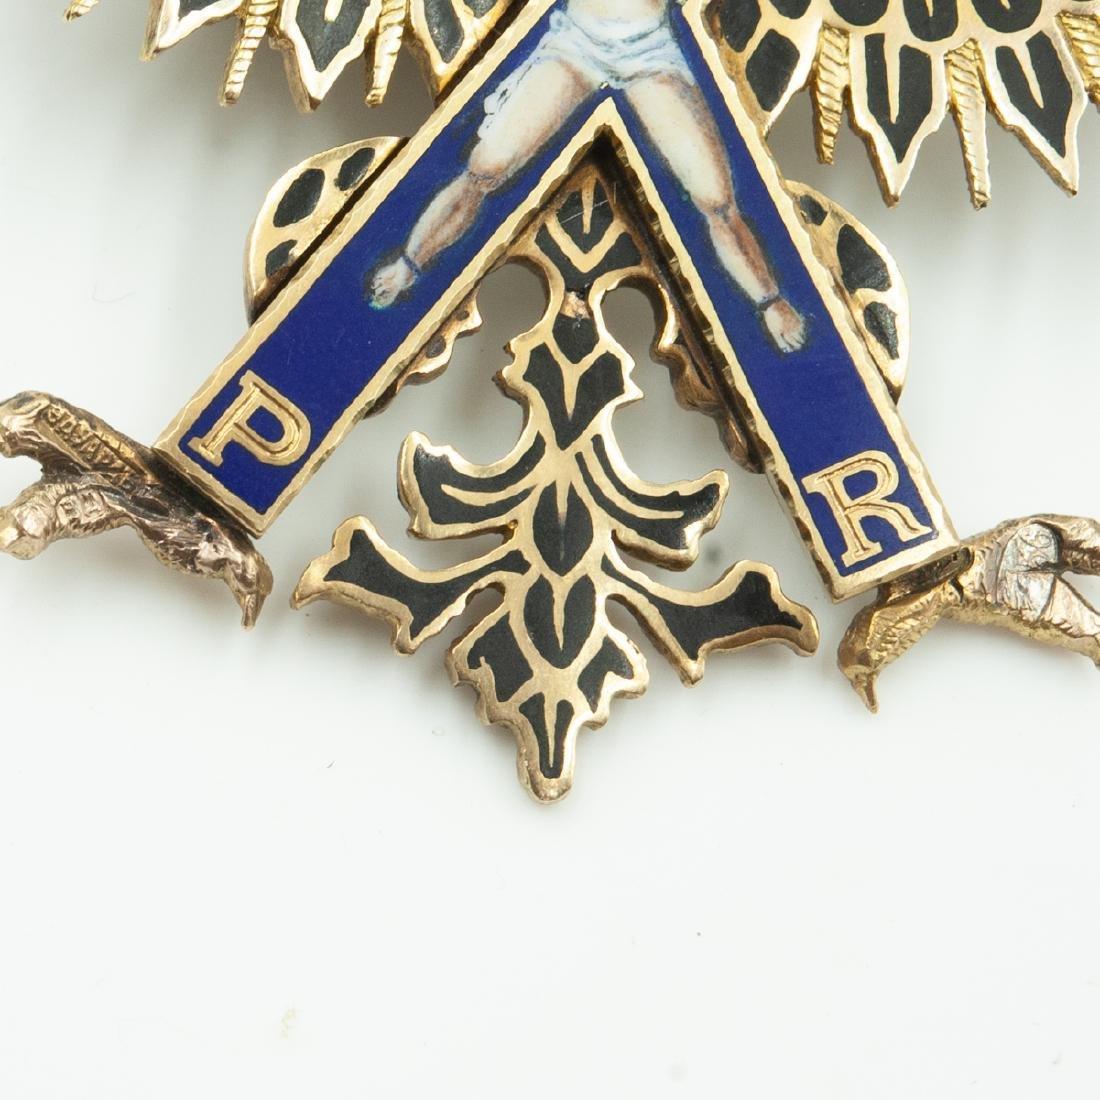 Rare Imperial Russian Gold Enameled Sash Badge - 6